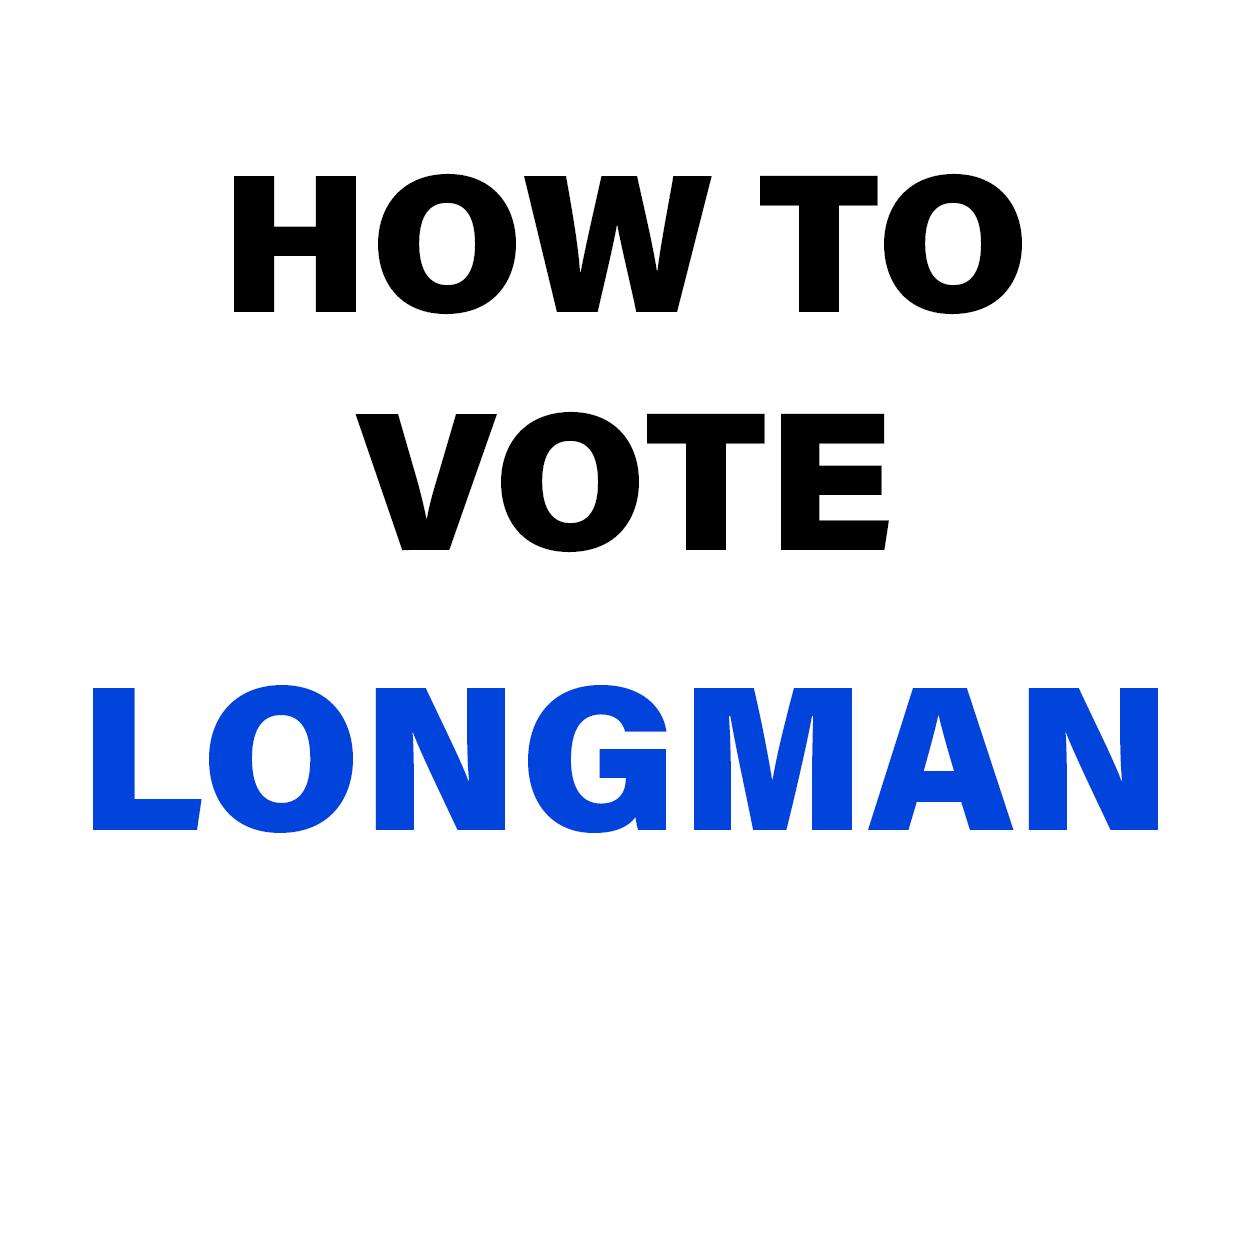 LONGMAN.png